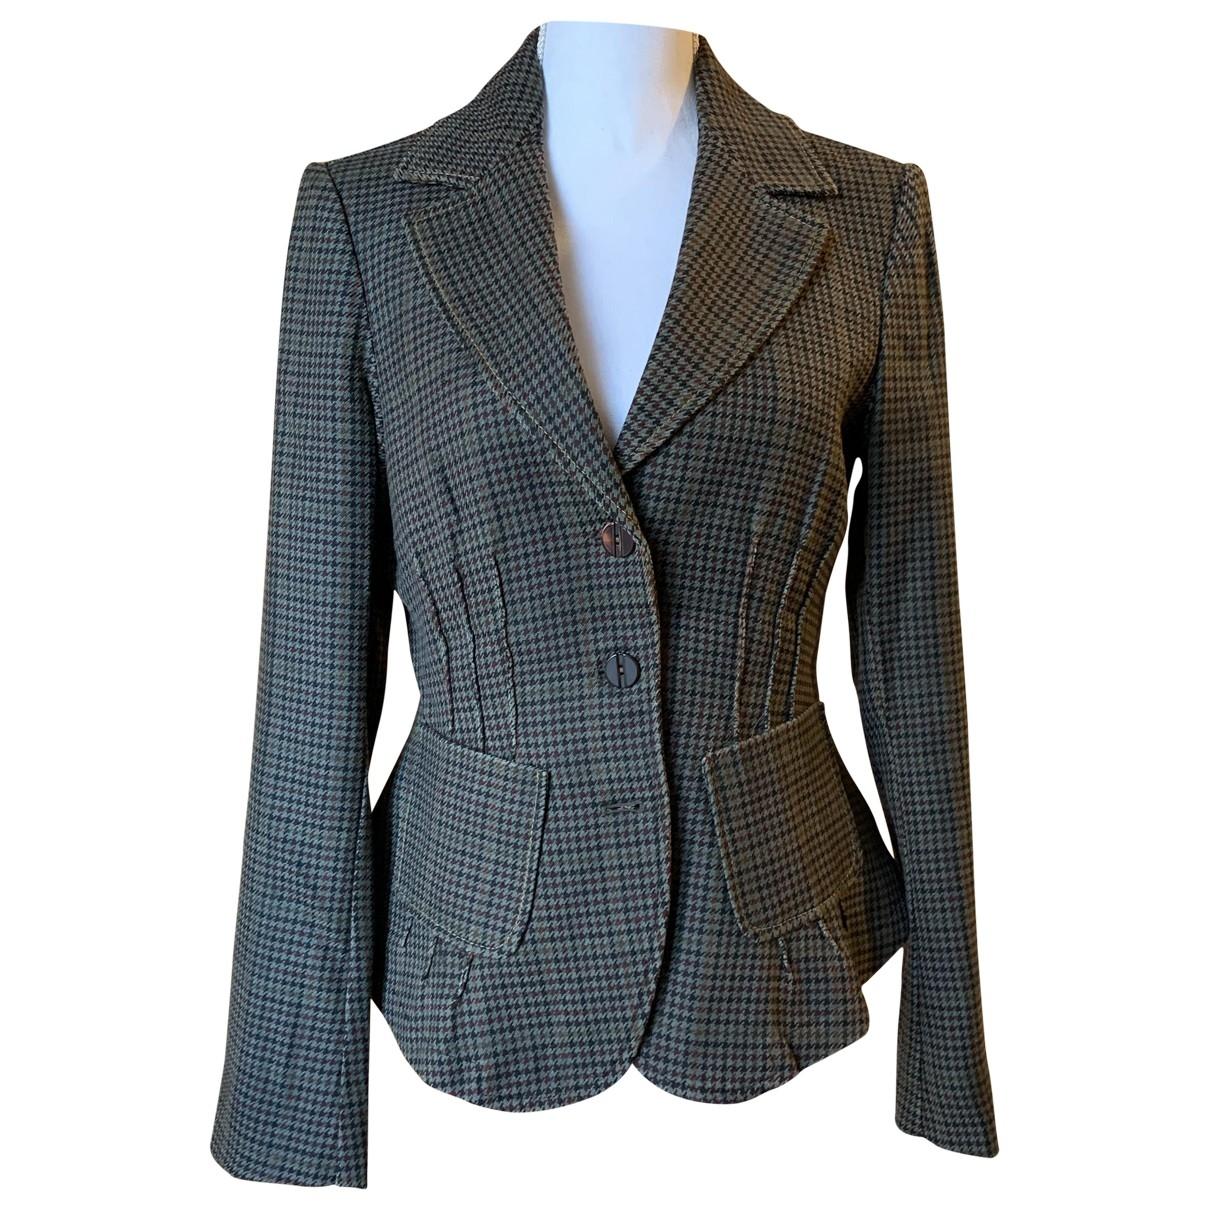 Patrizia Pepe \N Brown Wool jacket for Women 44 IT